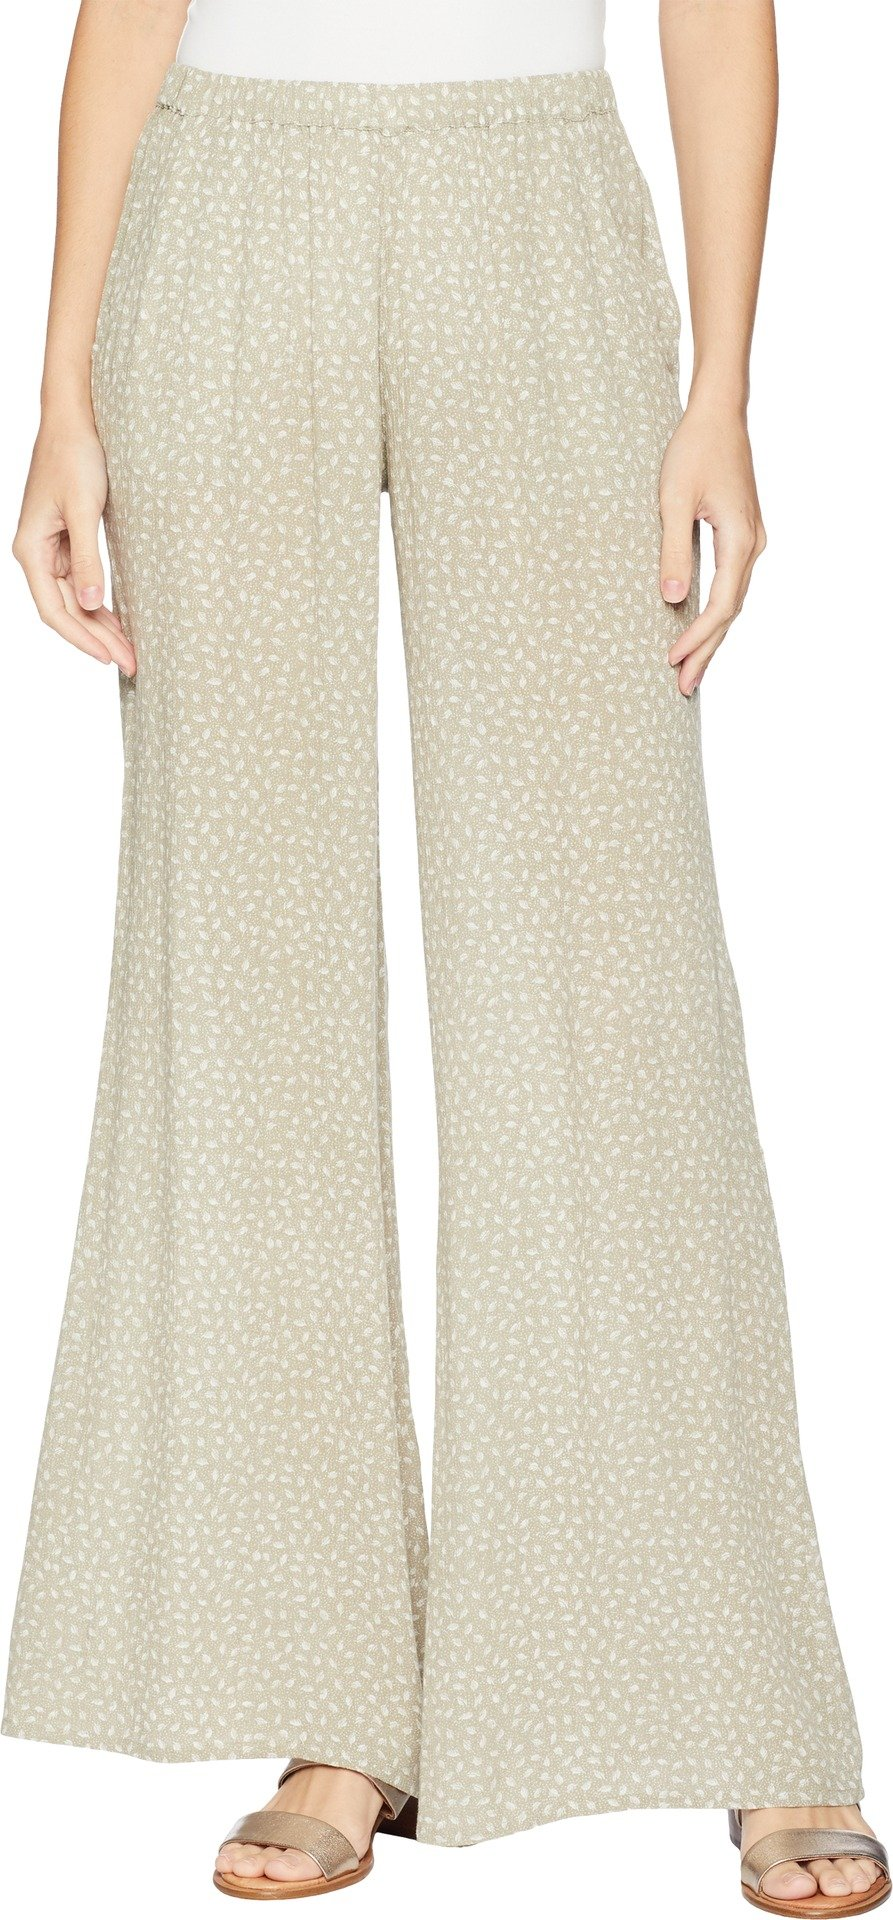 O'Neill Women's Romancing Pants,Small,Laurel Oak